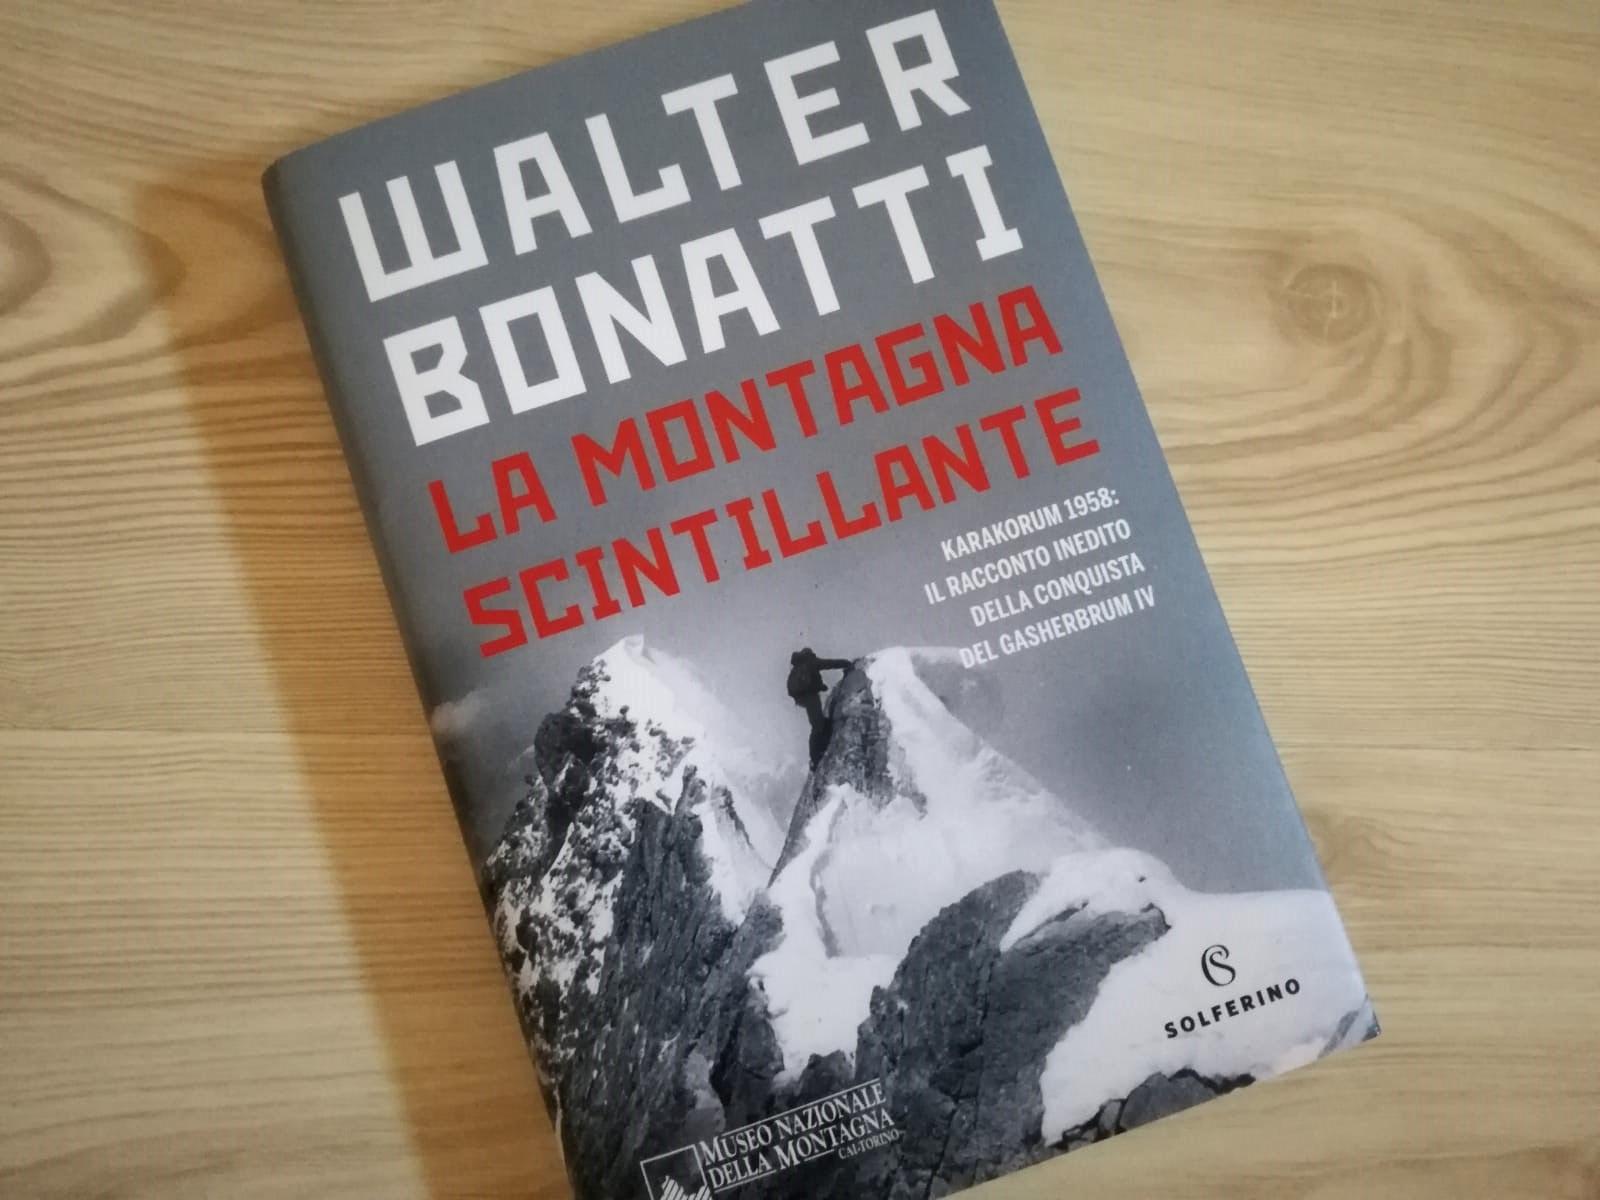 Walter Bonatti, Gasherbrum IV, la montagna scintillante, Solferino, libri